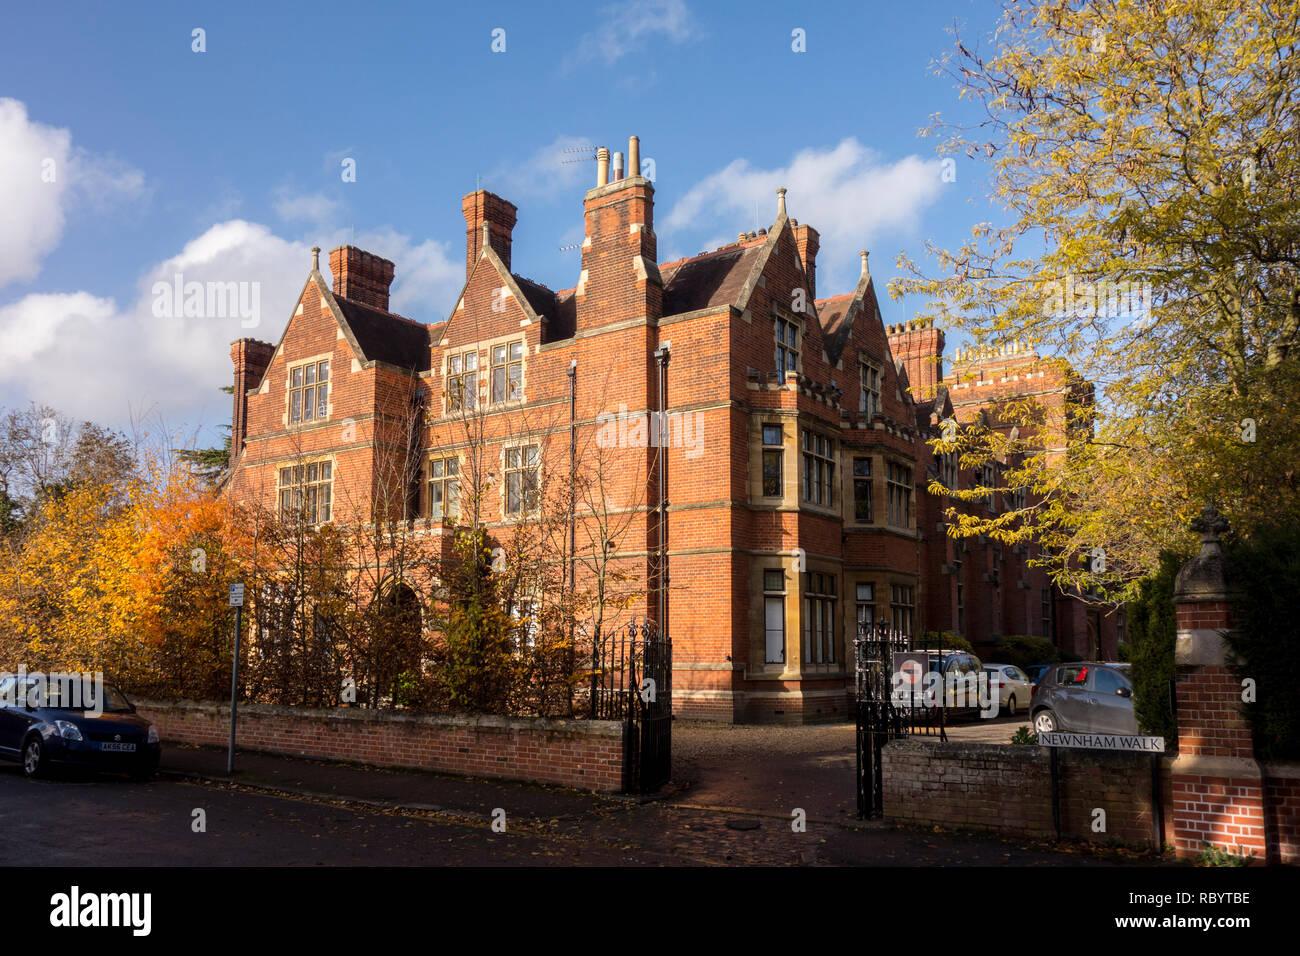 Ridley Hall, Cambridge, Theological College, Cambridge, Großbritannien Stockbild